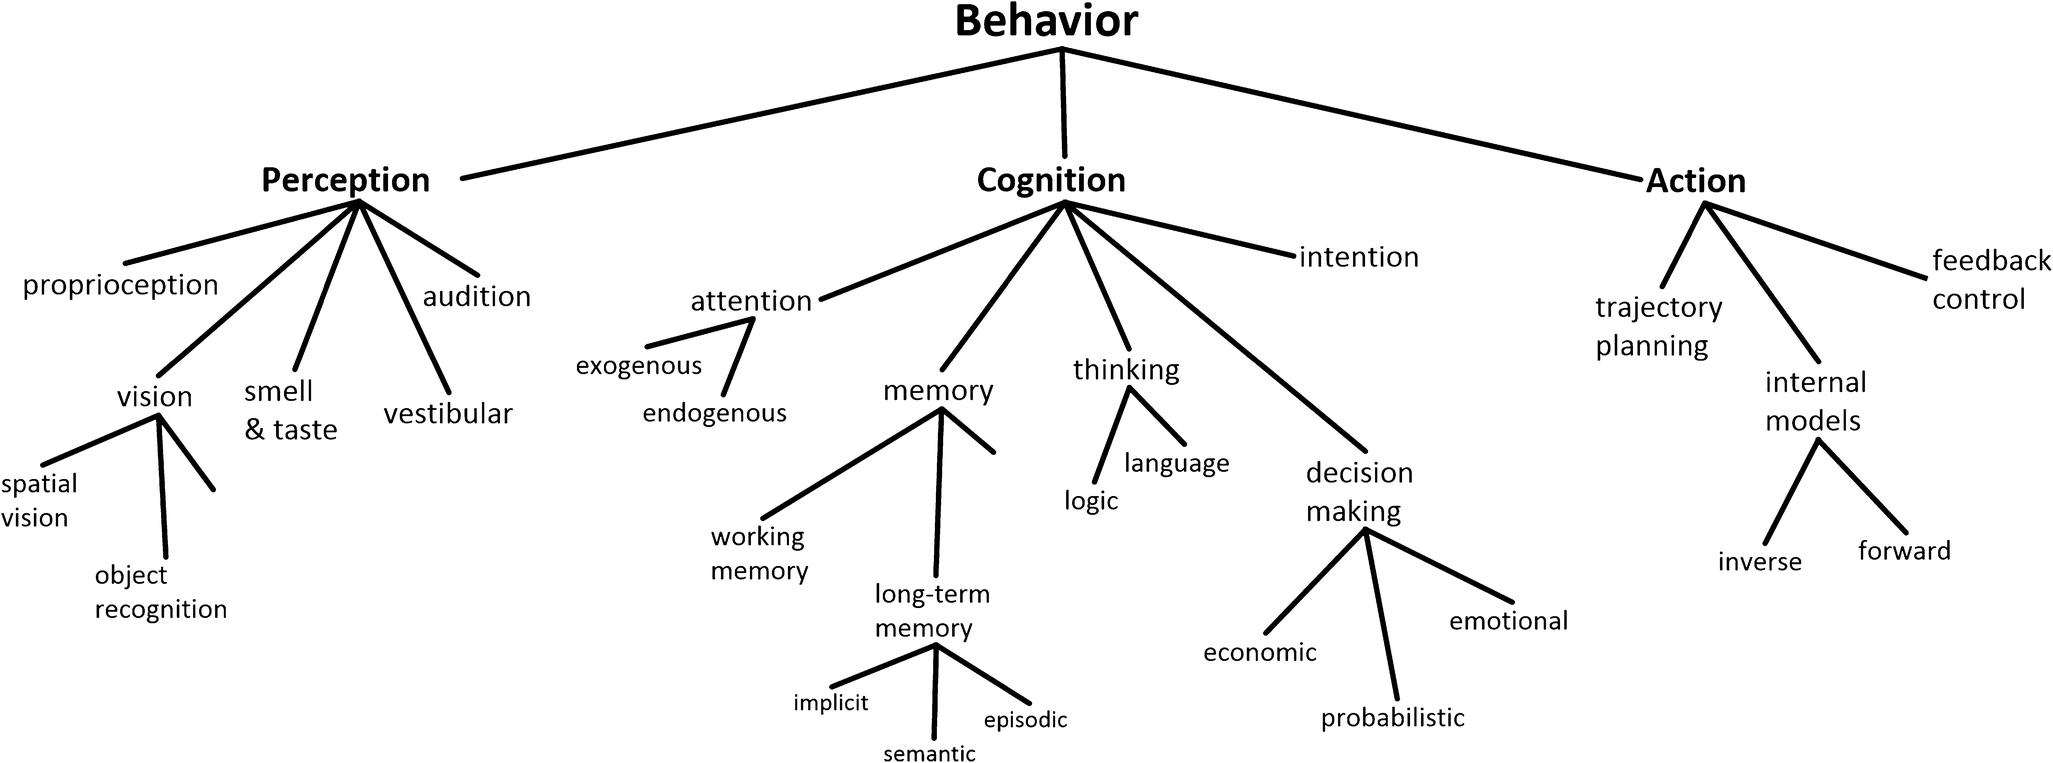 Resynthesizing behavior through phylogenetic refinement